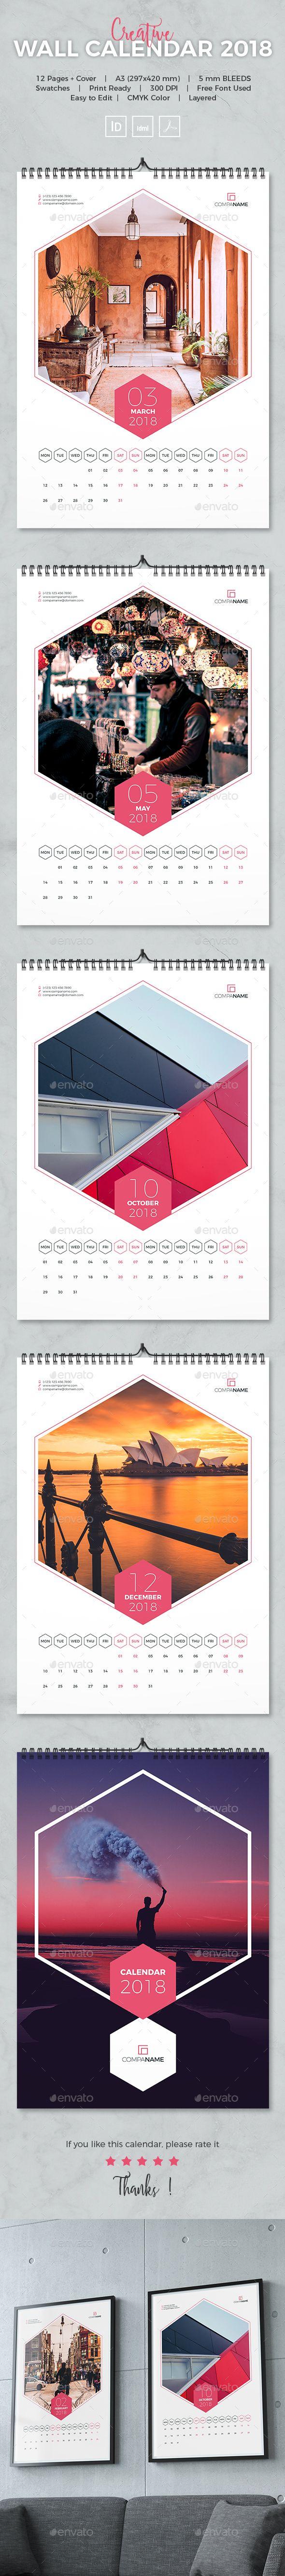 Calendario Indesign.Creative Wall Calendar 2018 A3 Template Indesign Indd